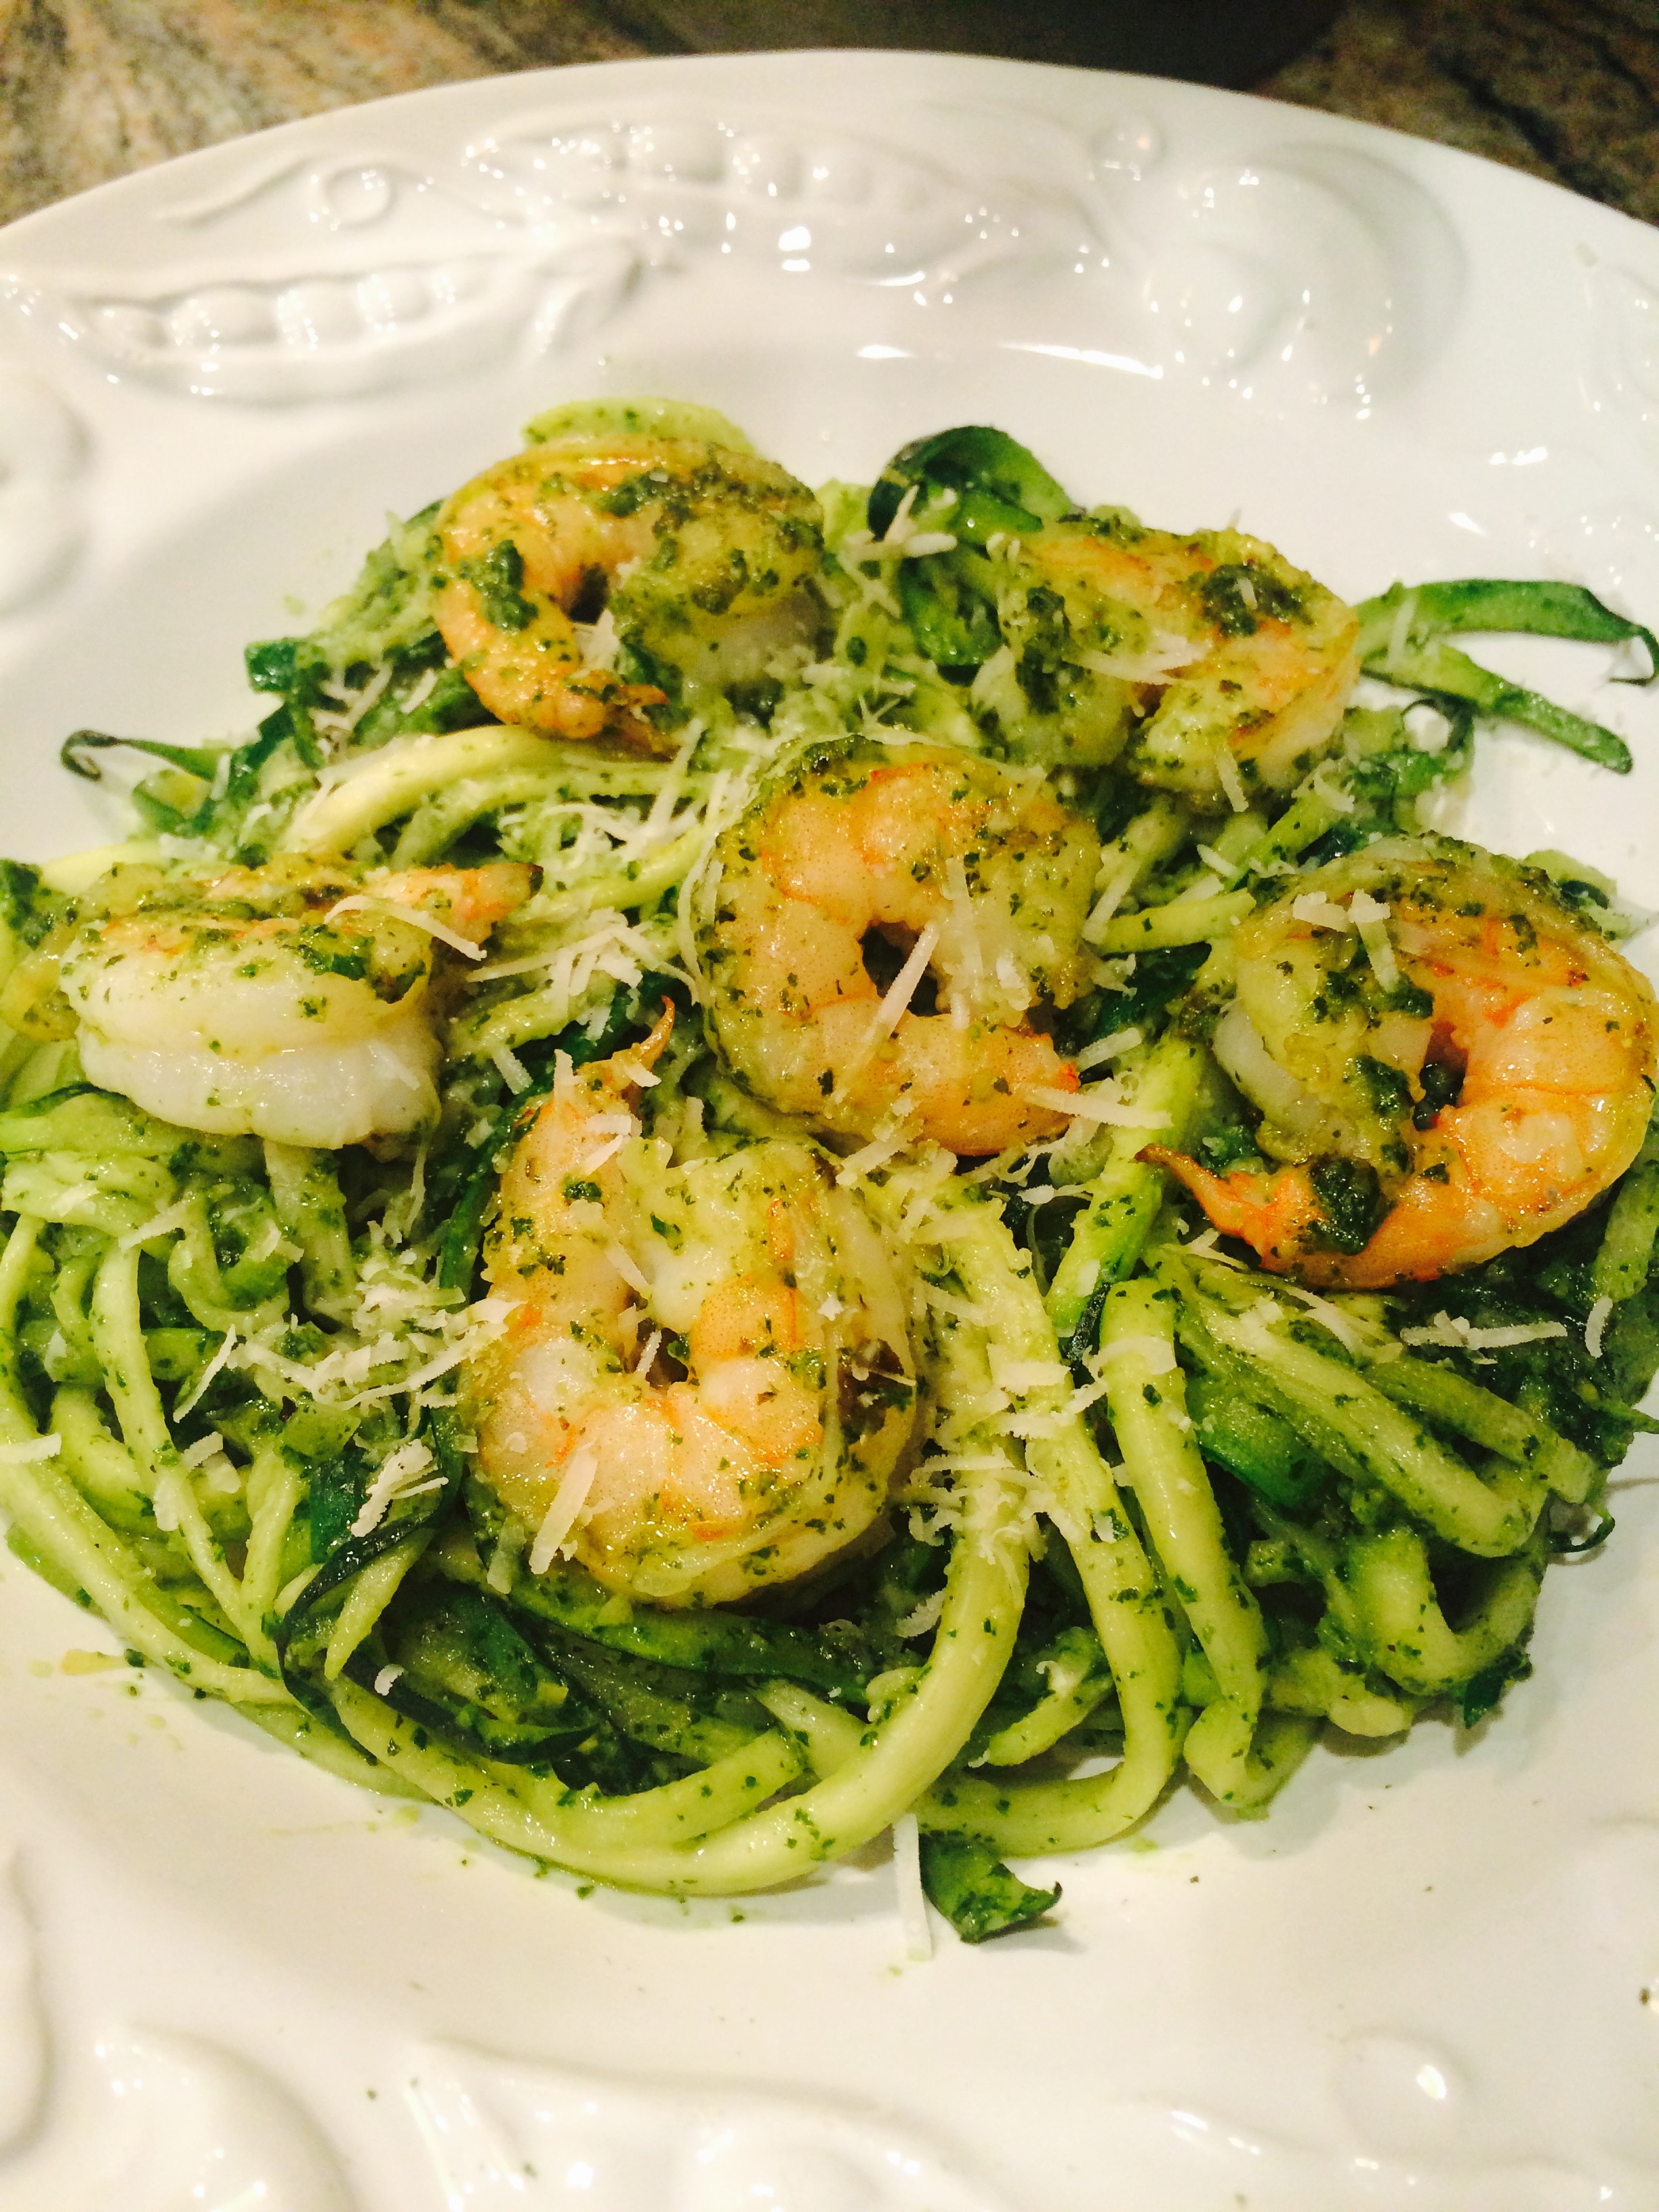 Zoodles & Shrimp with Lemon Pesto serves 4